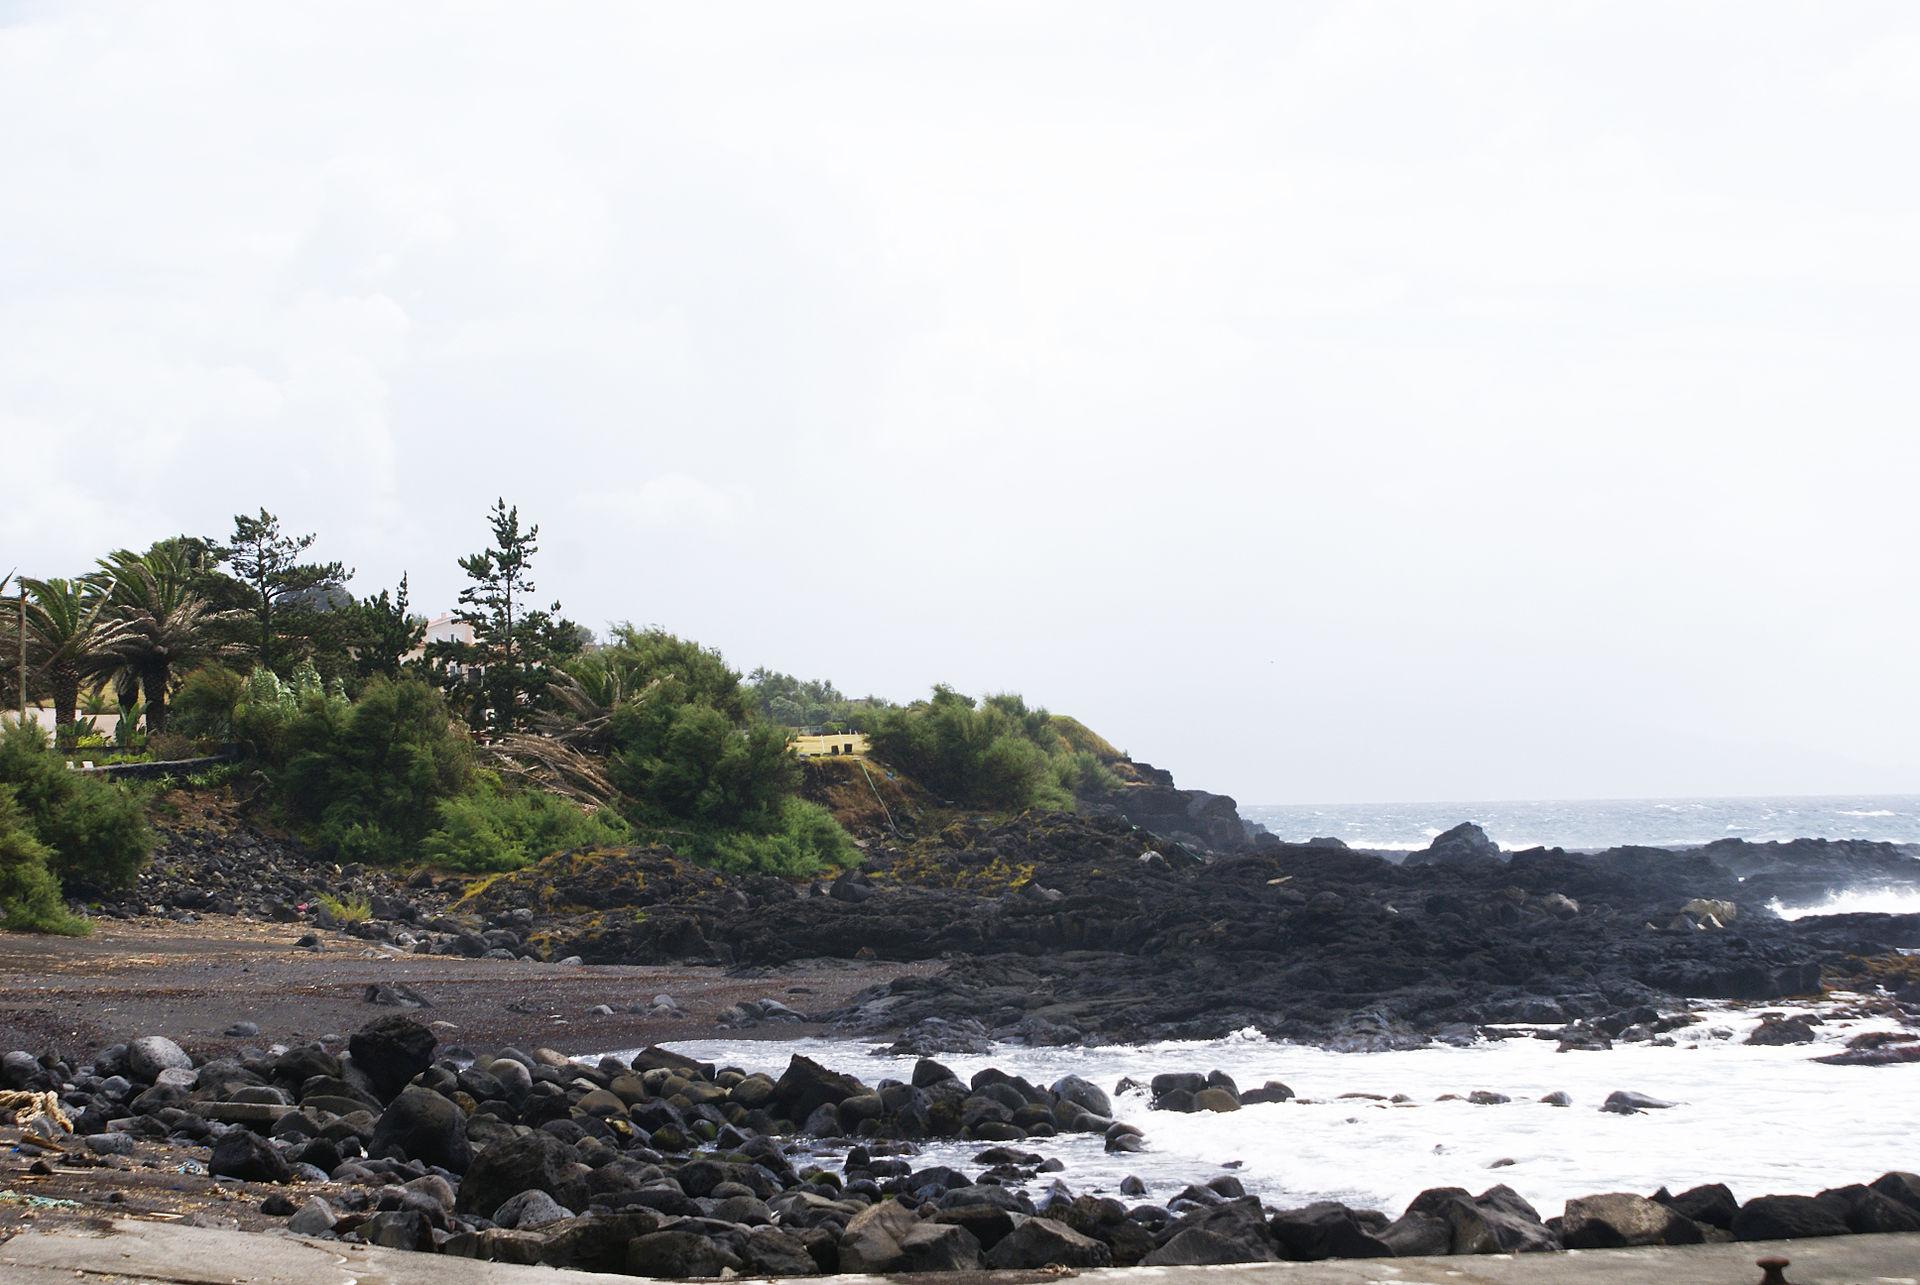 Praia da Feteira - Faial, Açores